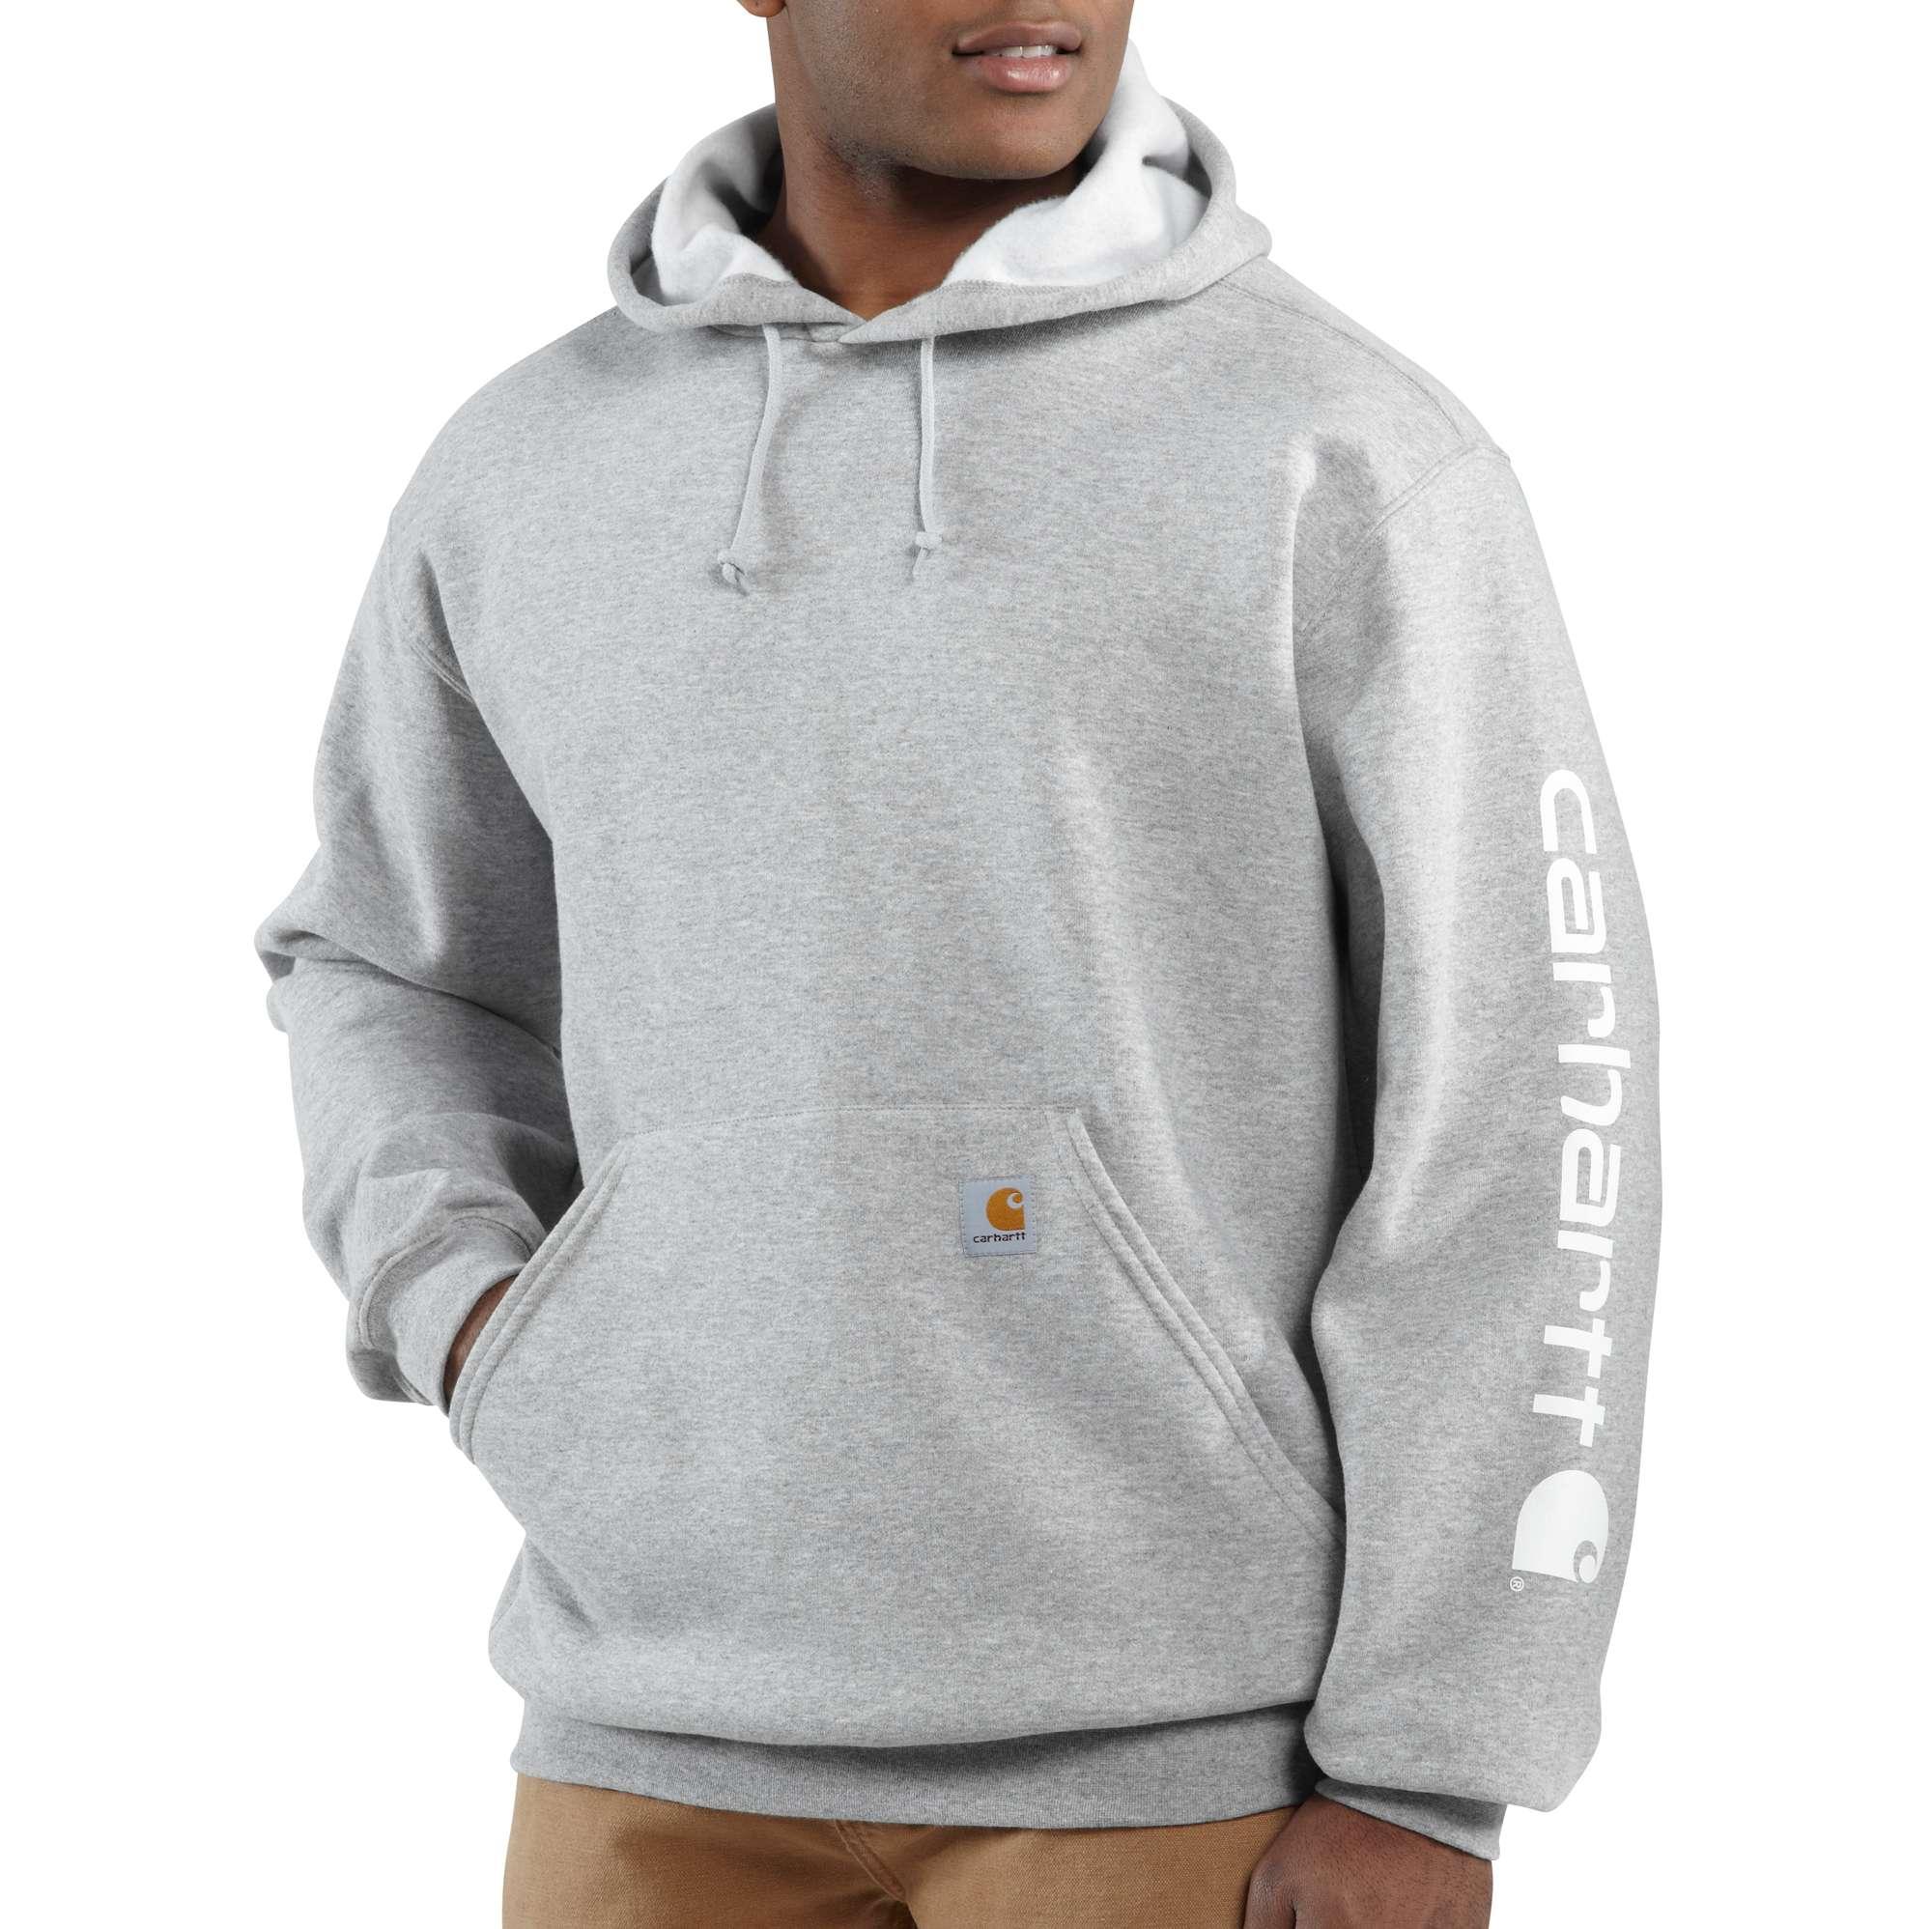 Men's Midweight Signature Logo Sleeve Hooded Sweatshirt, Heather Gray, swatch